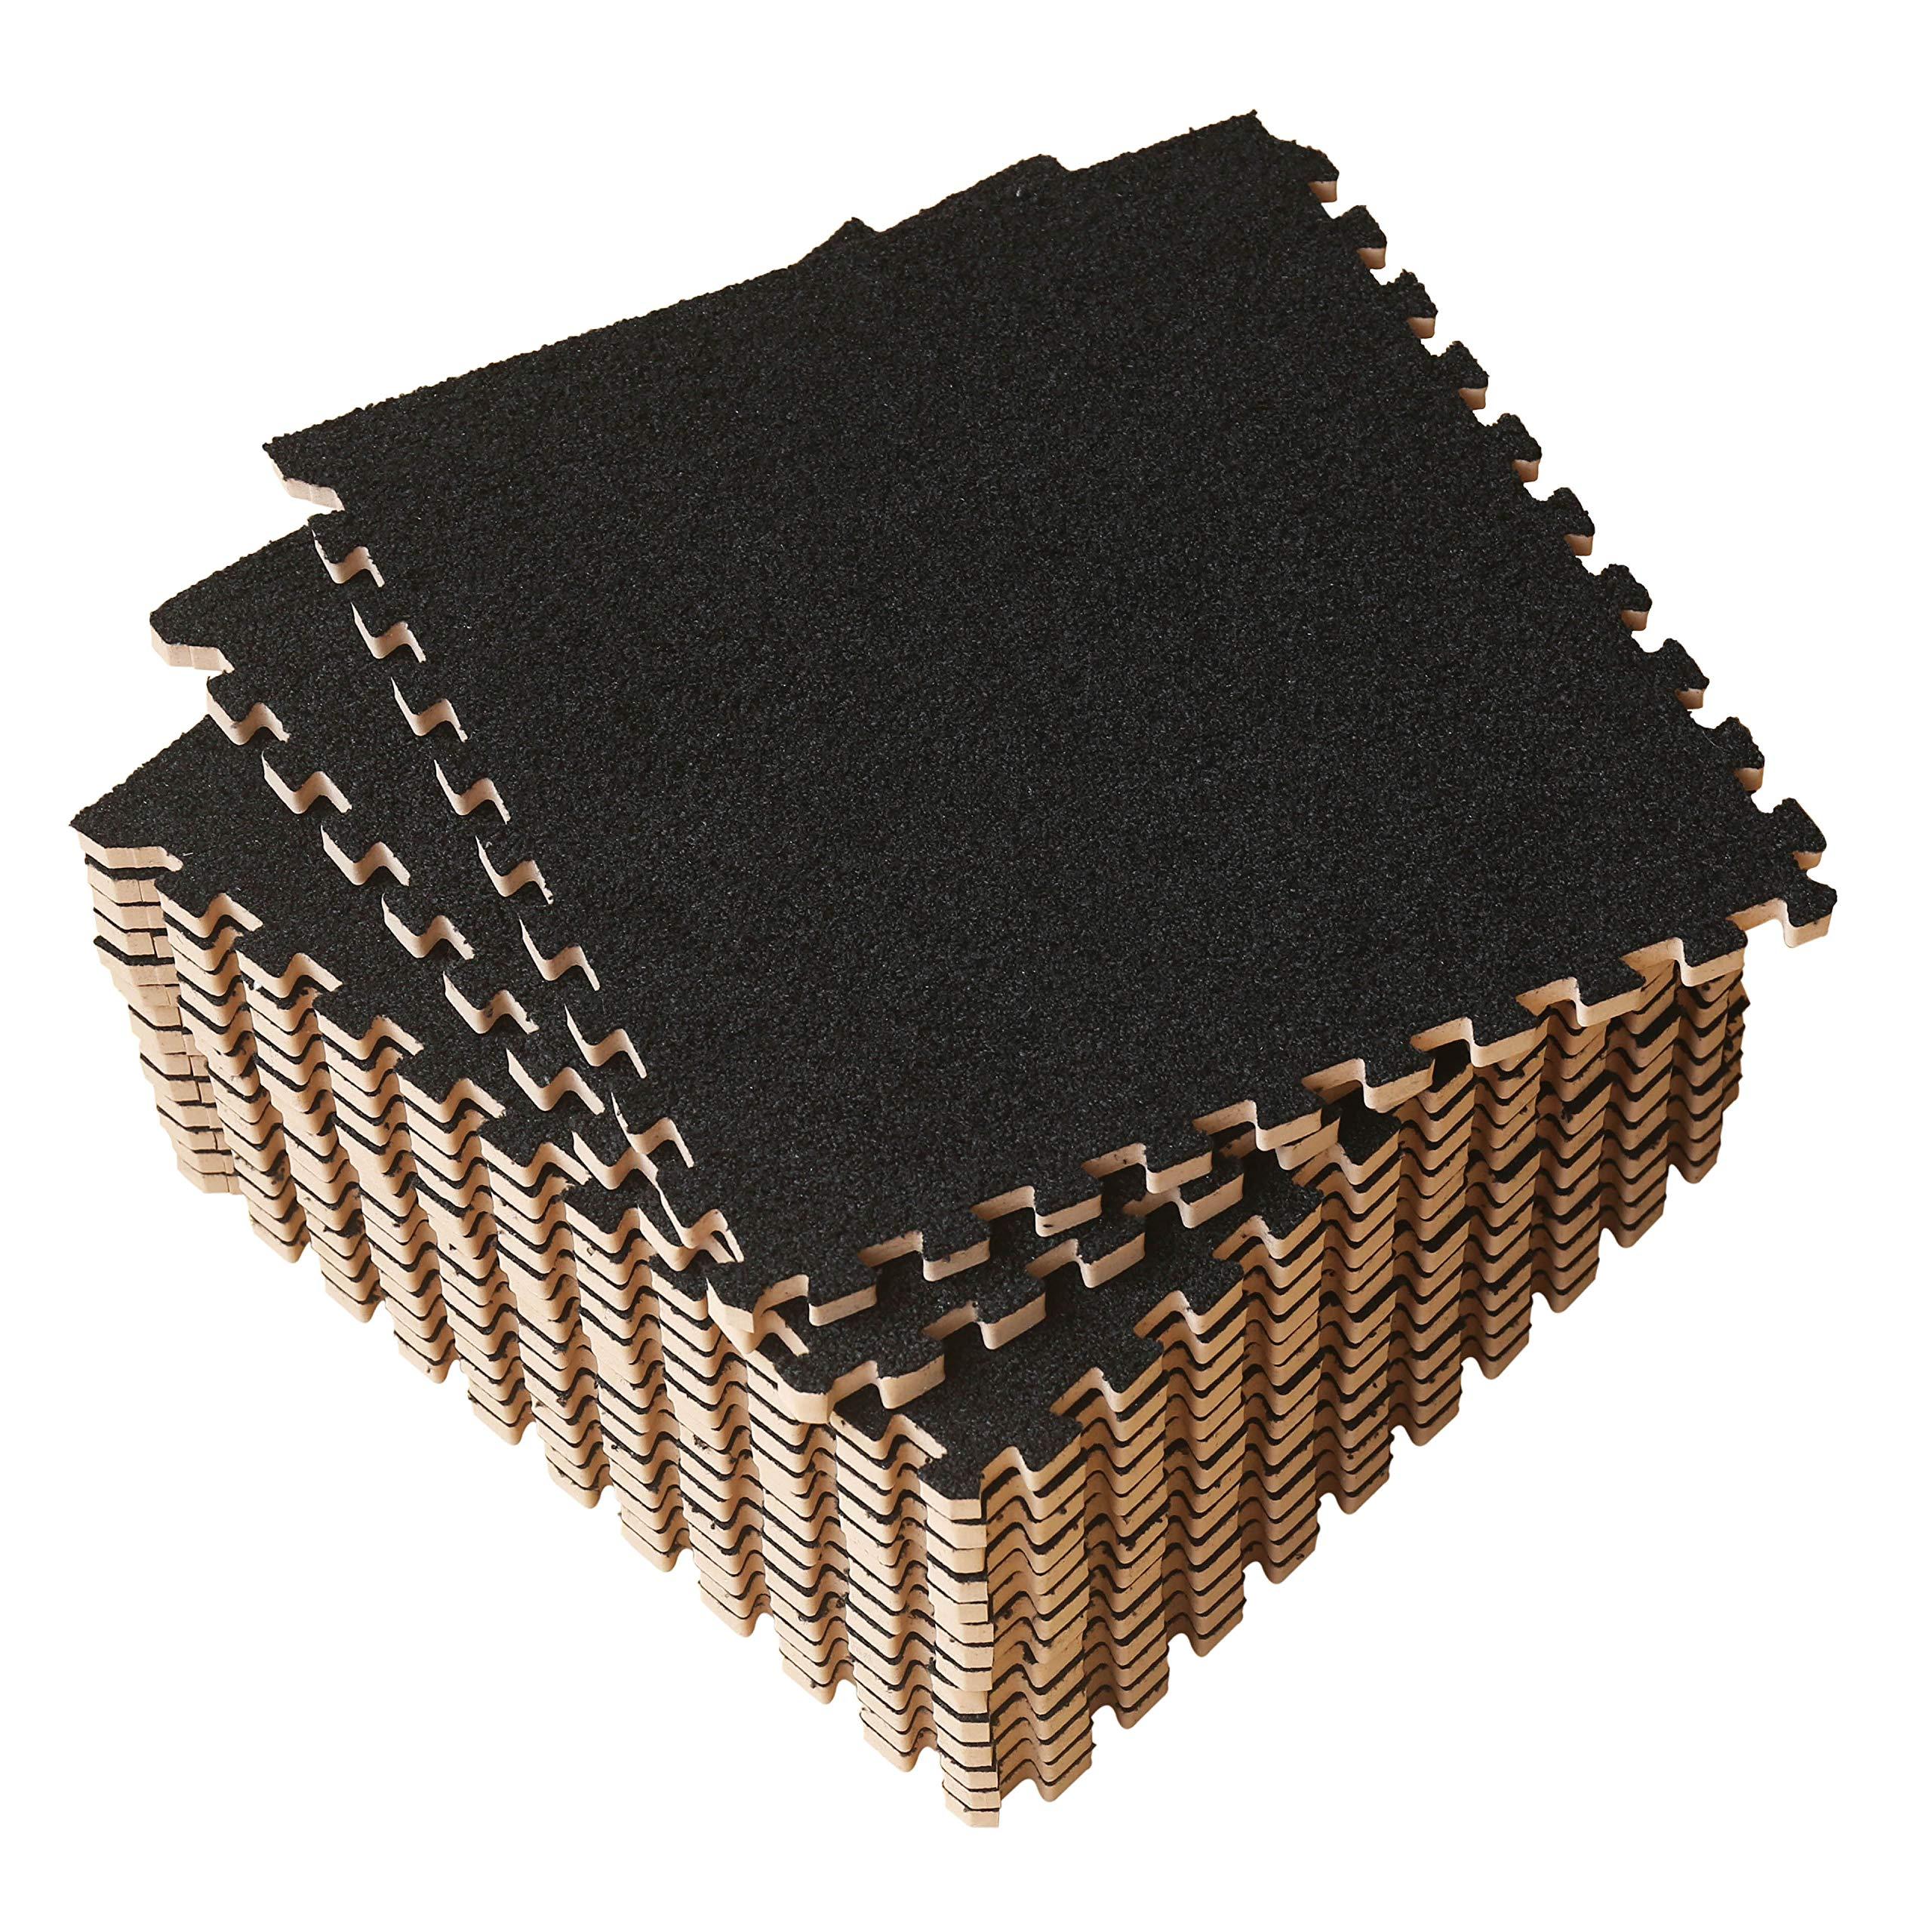 LaFamille Interlocking Foam Floor Mat 16 Tiles 16 sq.ft Puzzle Carpet Flooring Exercise Square Mats Gym,Playroom Floor Mats for Carpet 1'x1' (Black)